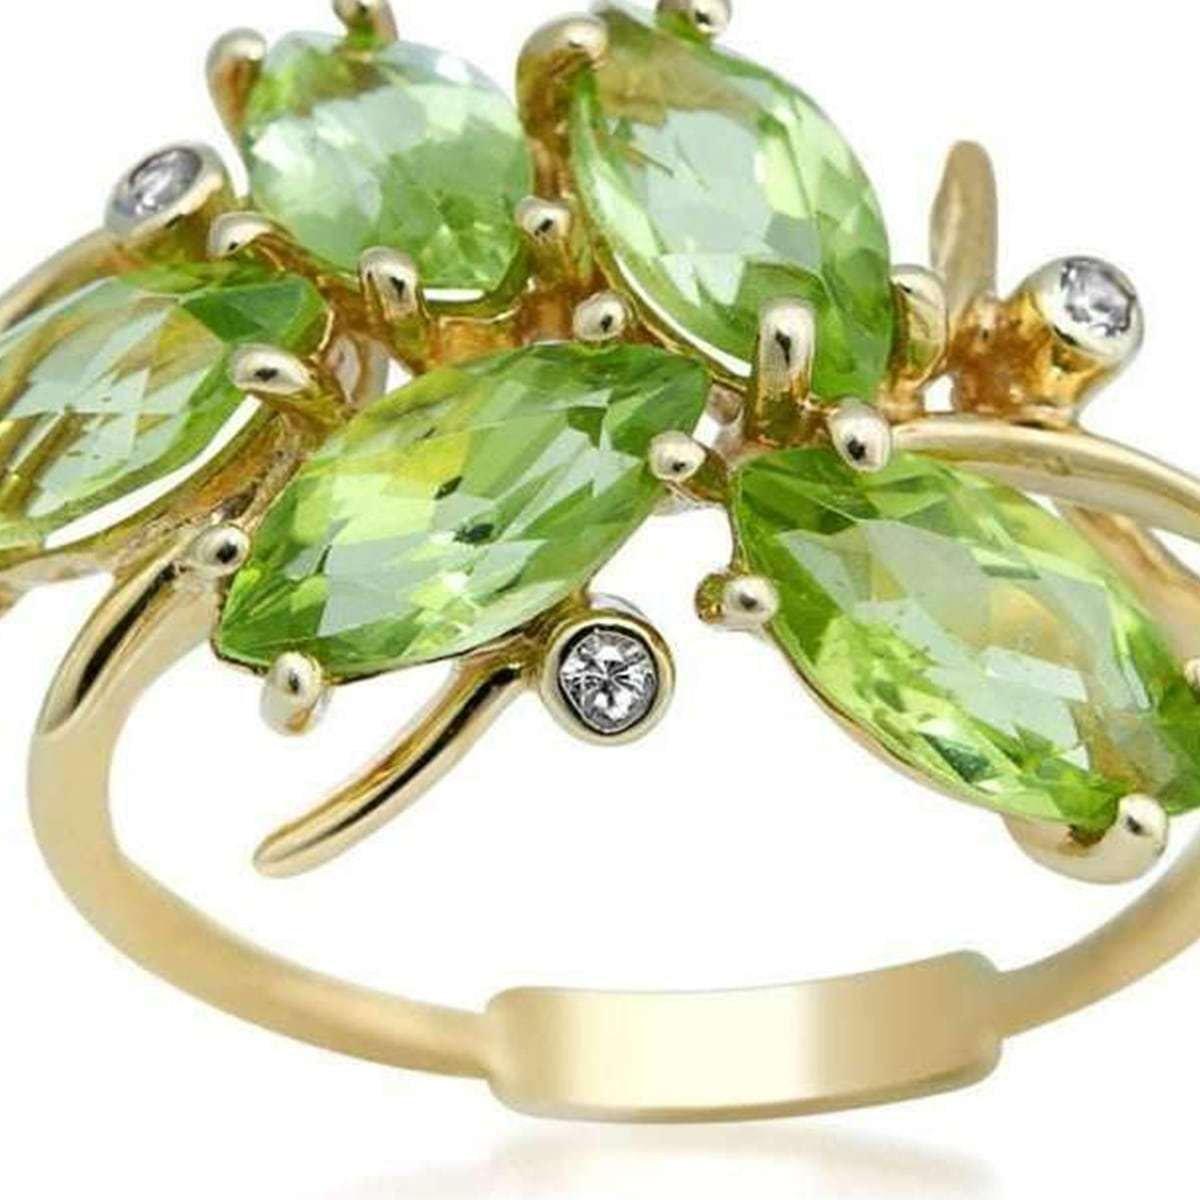 August birthstone - peridot ring